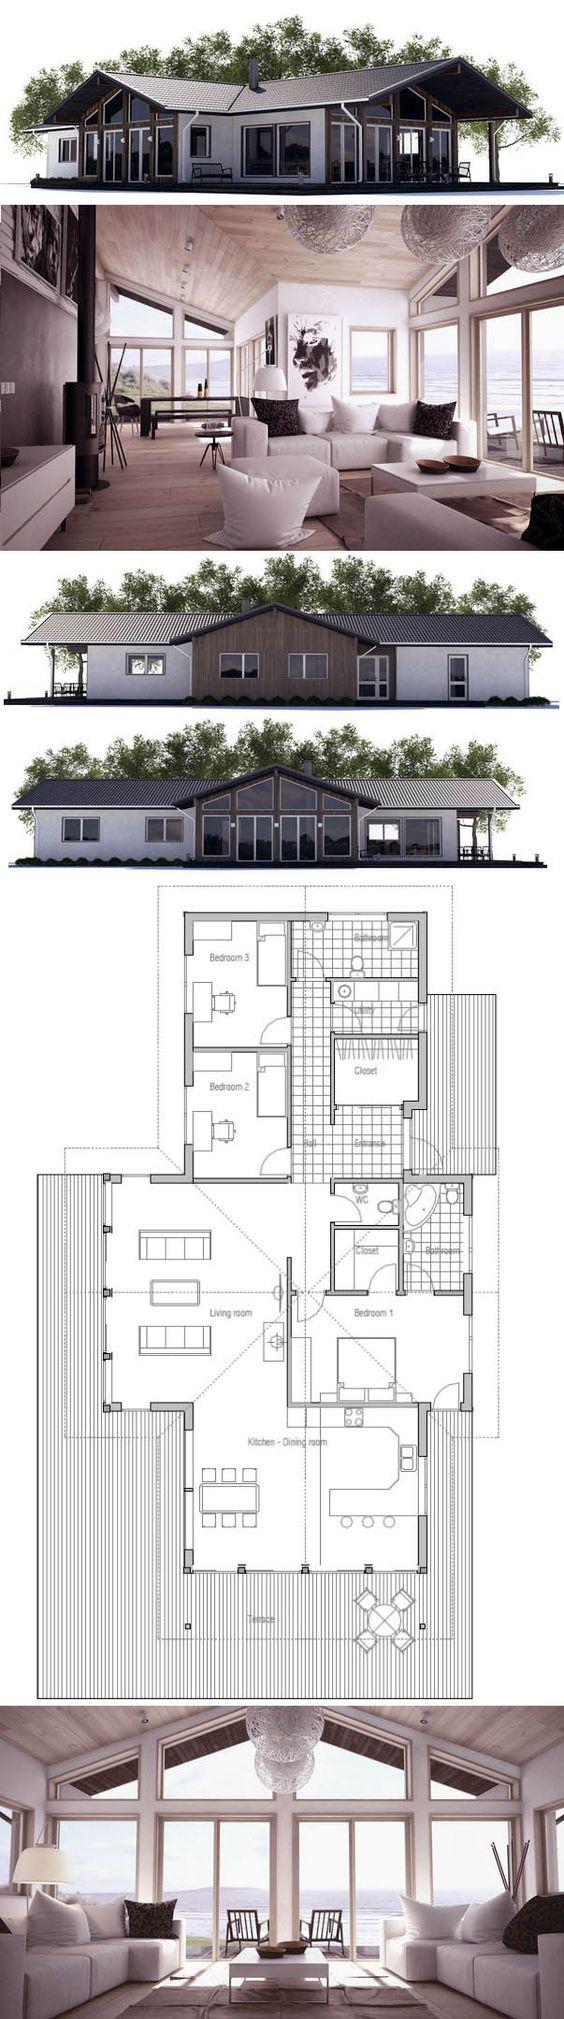 Kleines Haus Hausplan Plans P Dorysy Pinterest